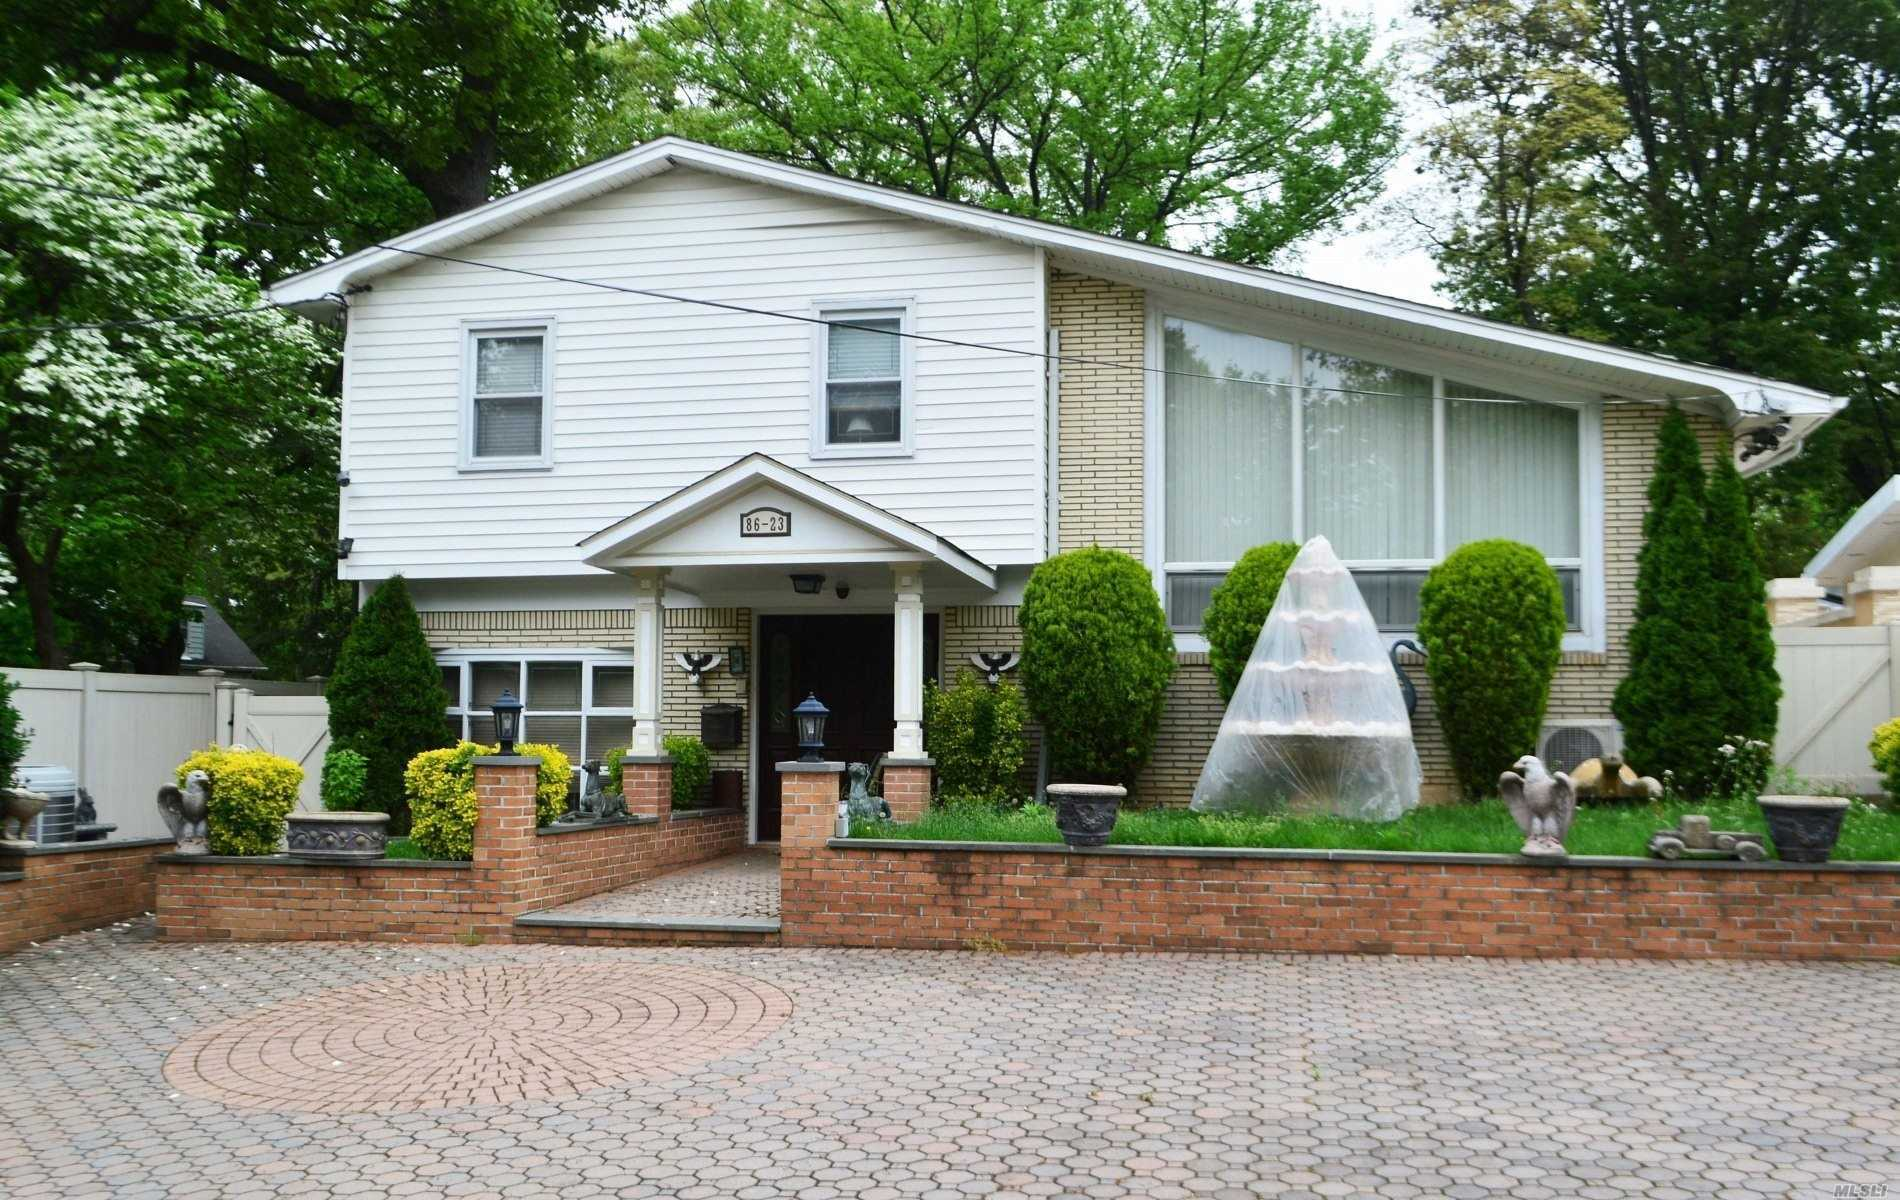 86-23 Sancho St Holliswood, NY 11423